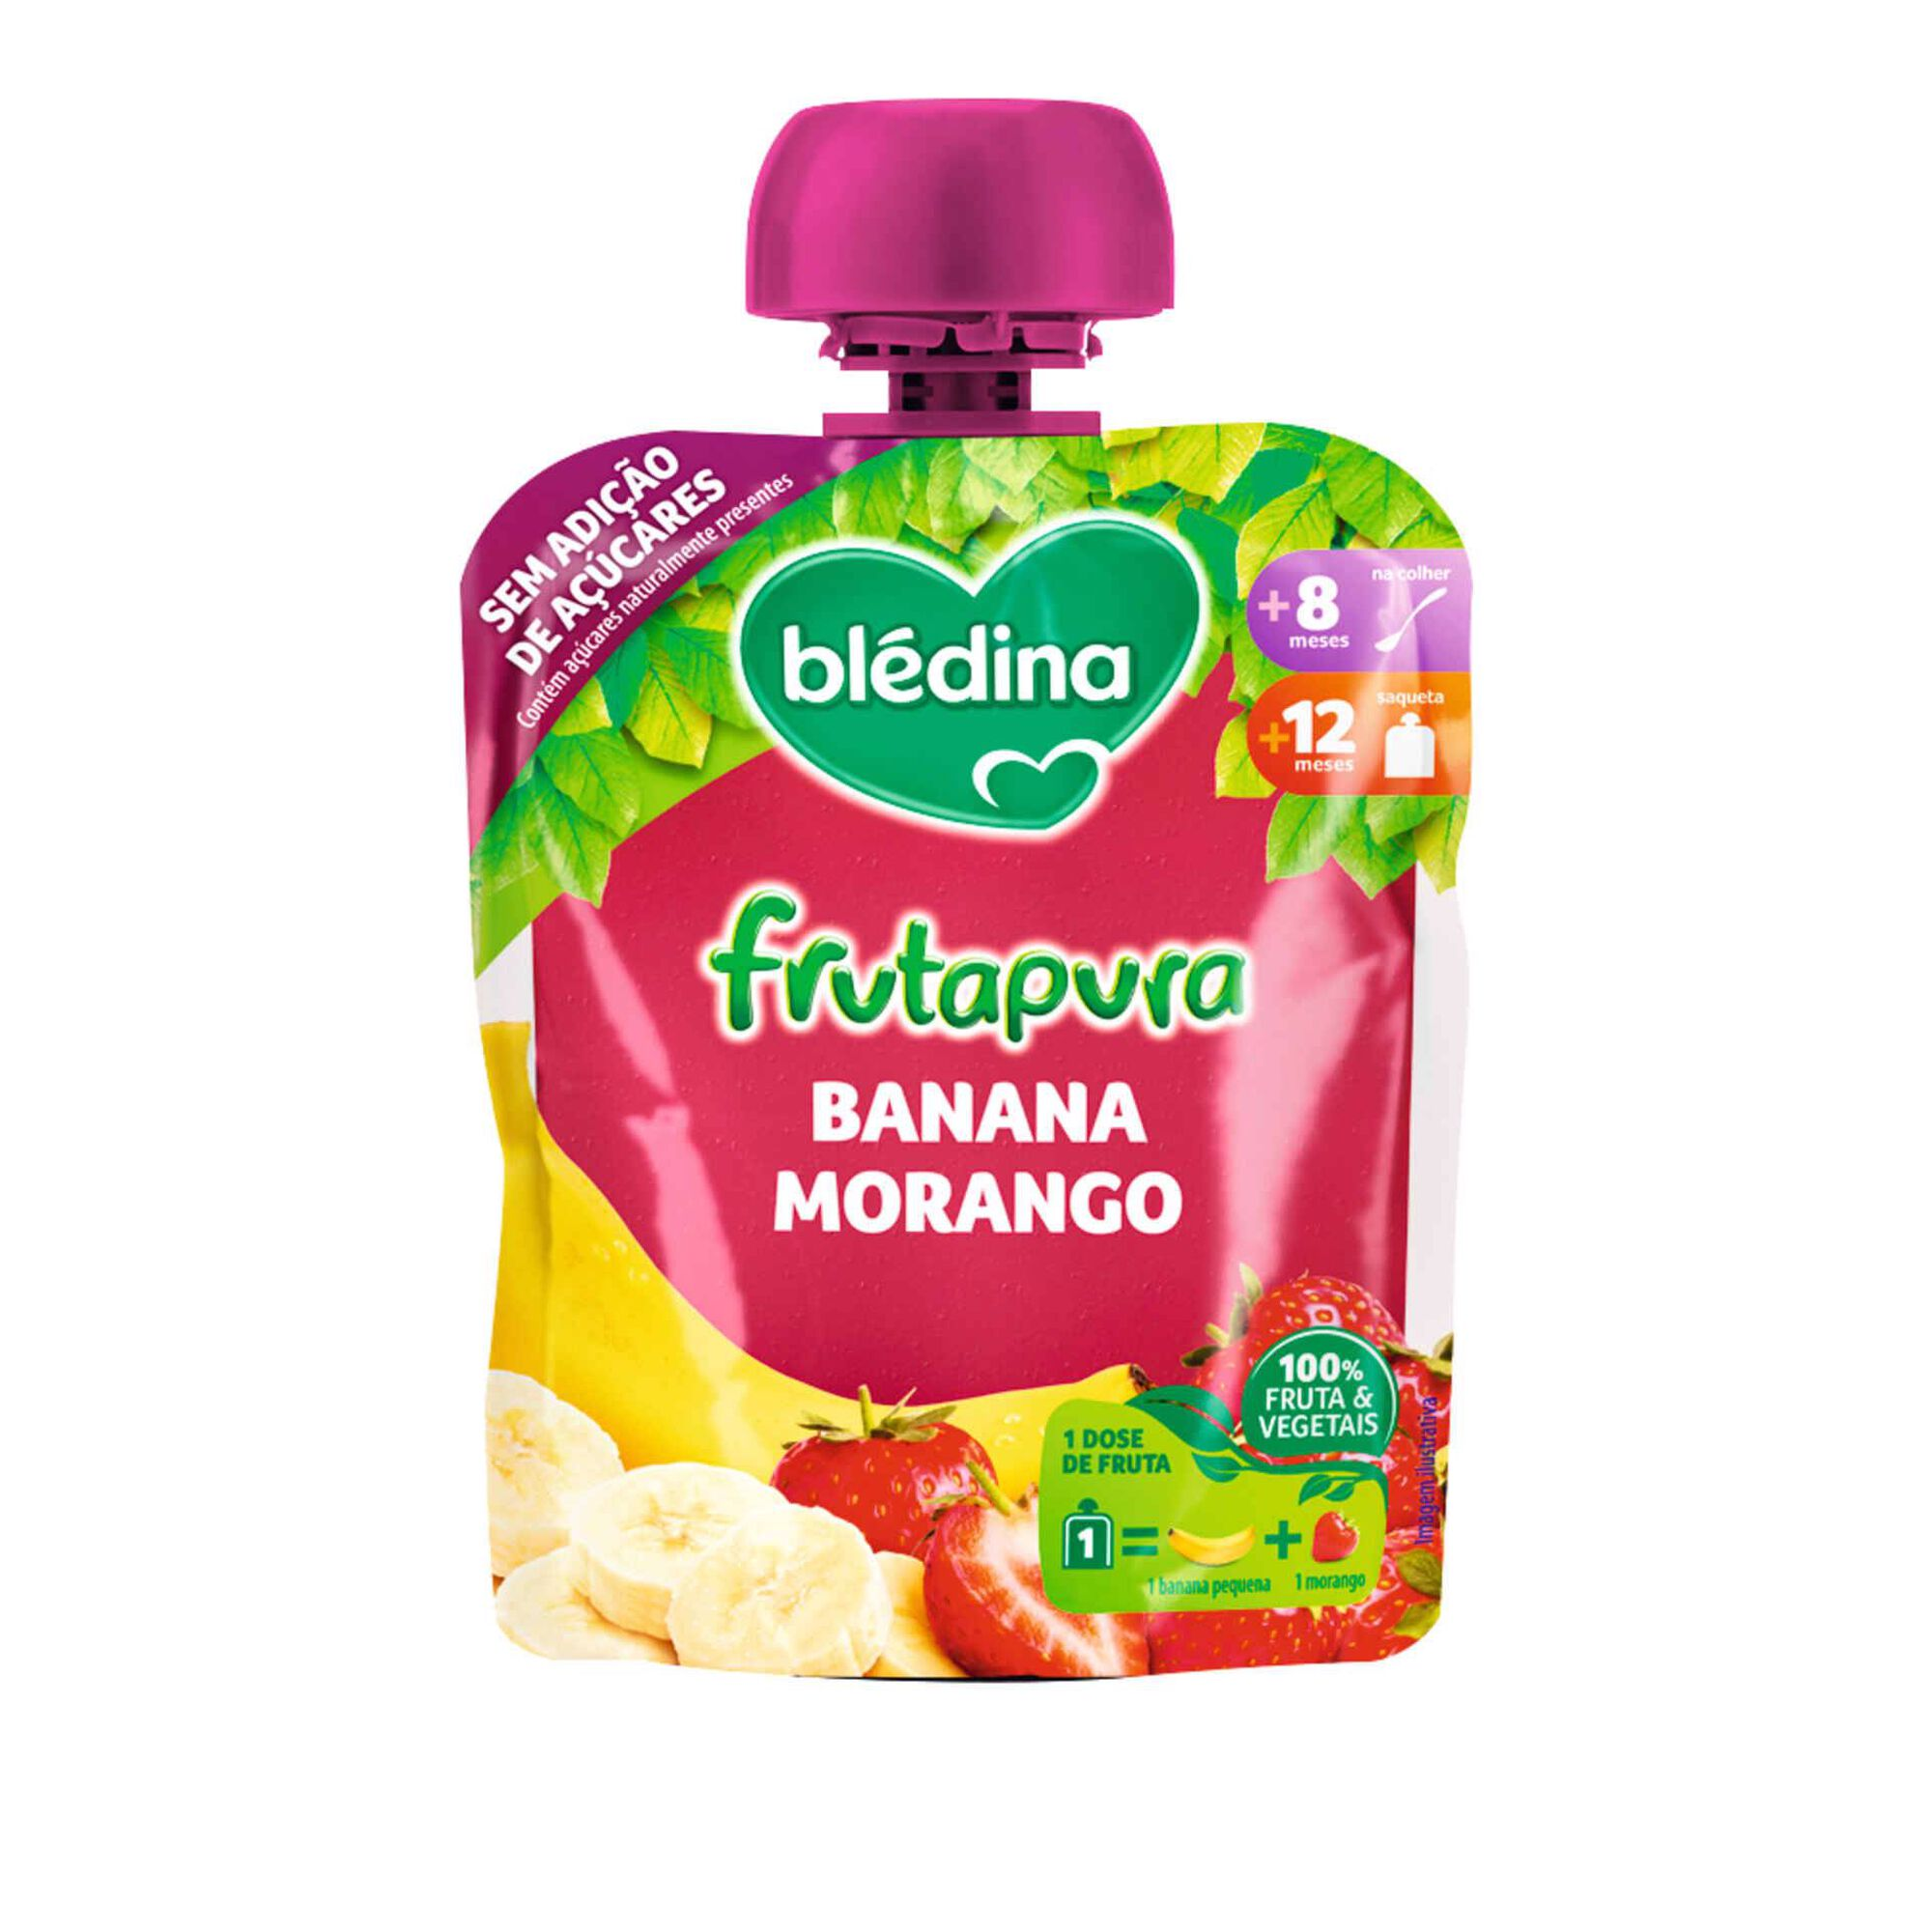 Saqueta de Fruta Banana e Morango Frutapura +8 Meses